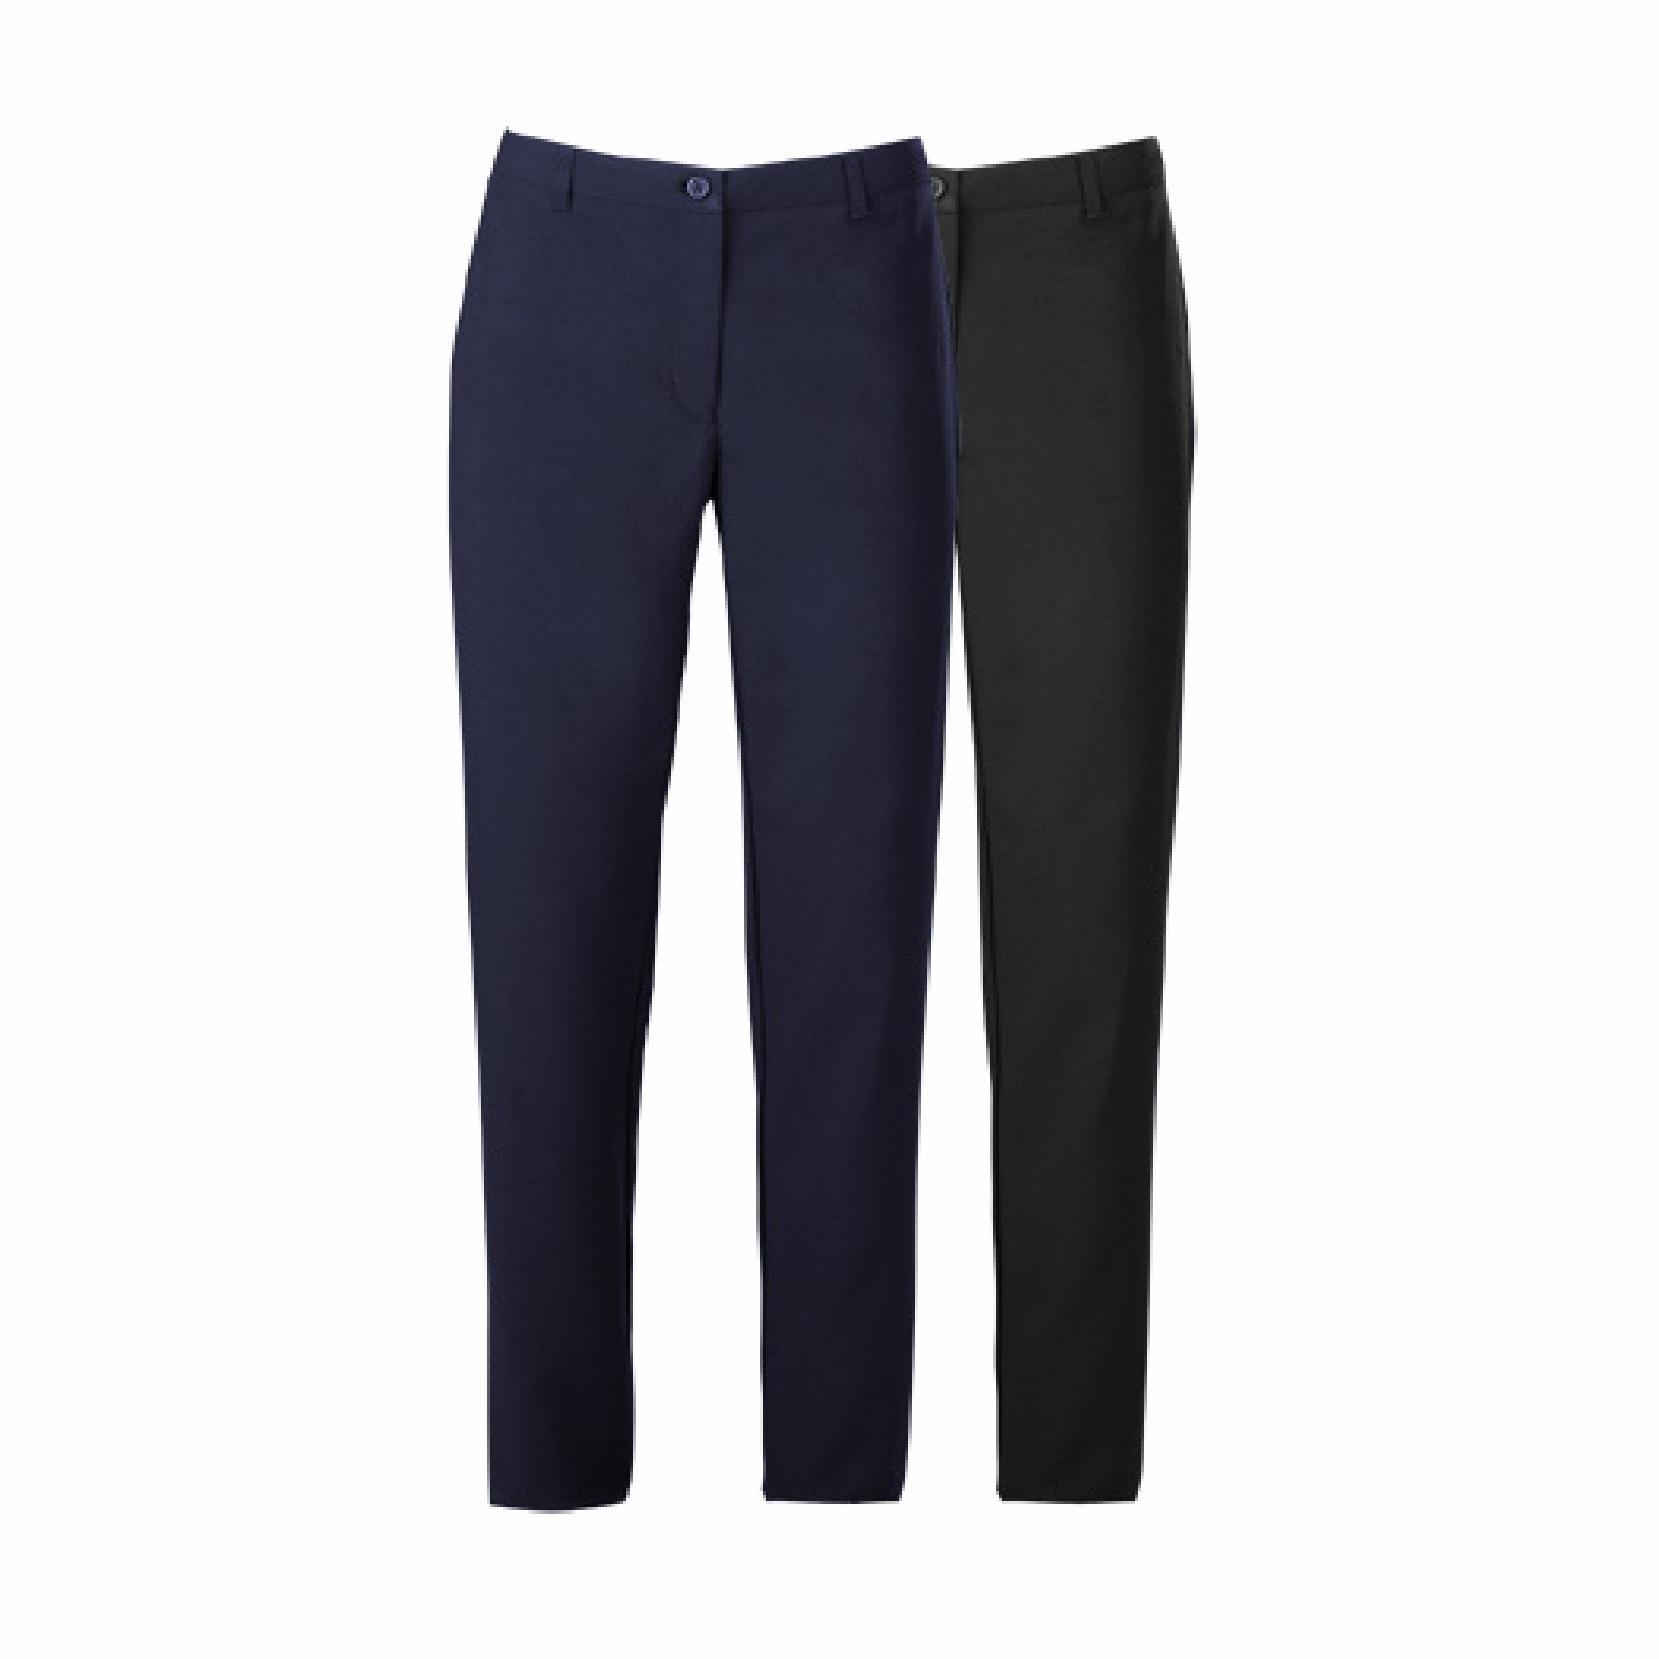 Women's Bootleg Trousers